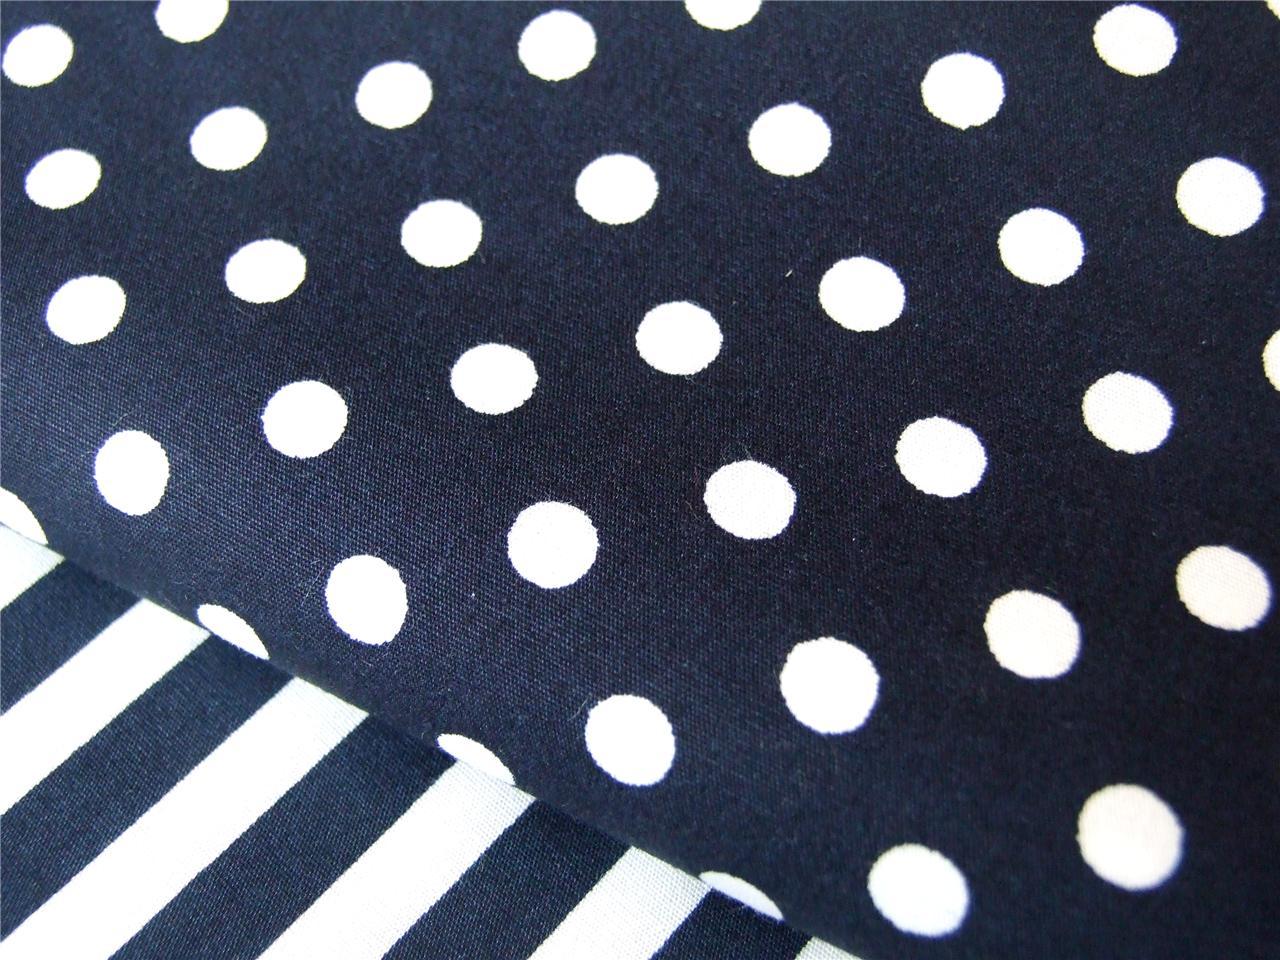 Pale Blue Navy Spotty Polka Dot Cotton Fabric For Dress